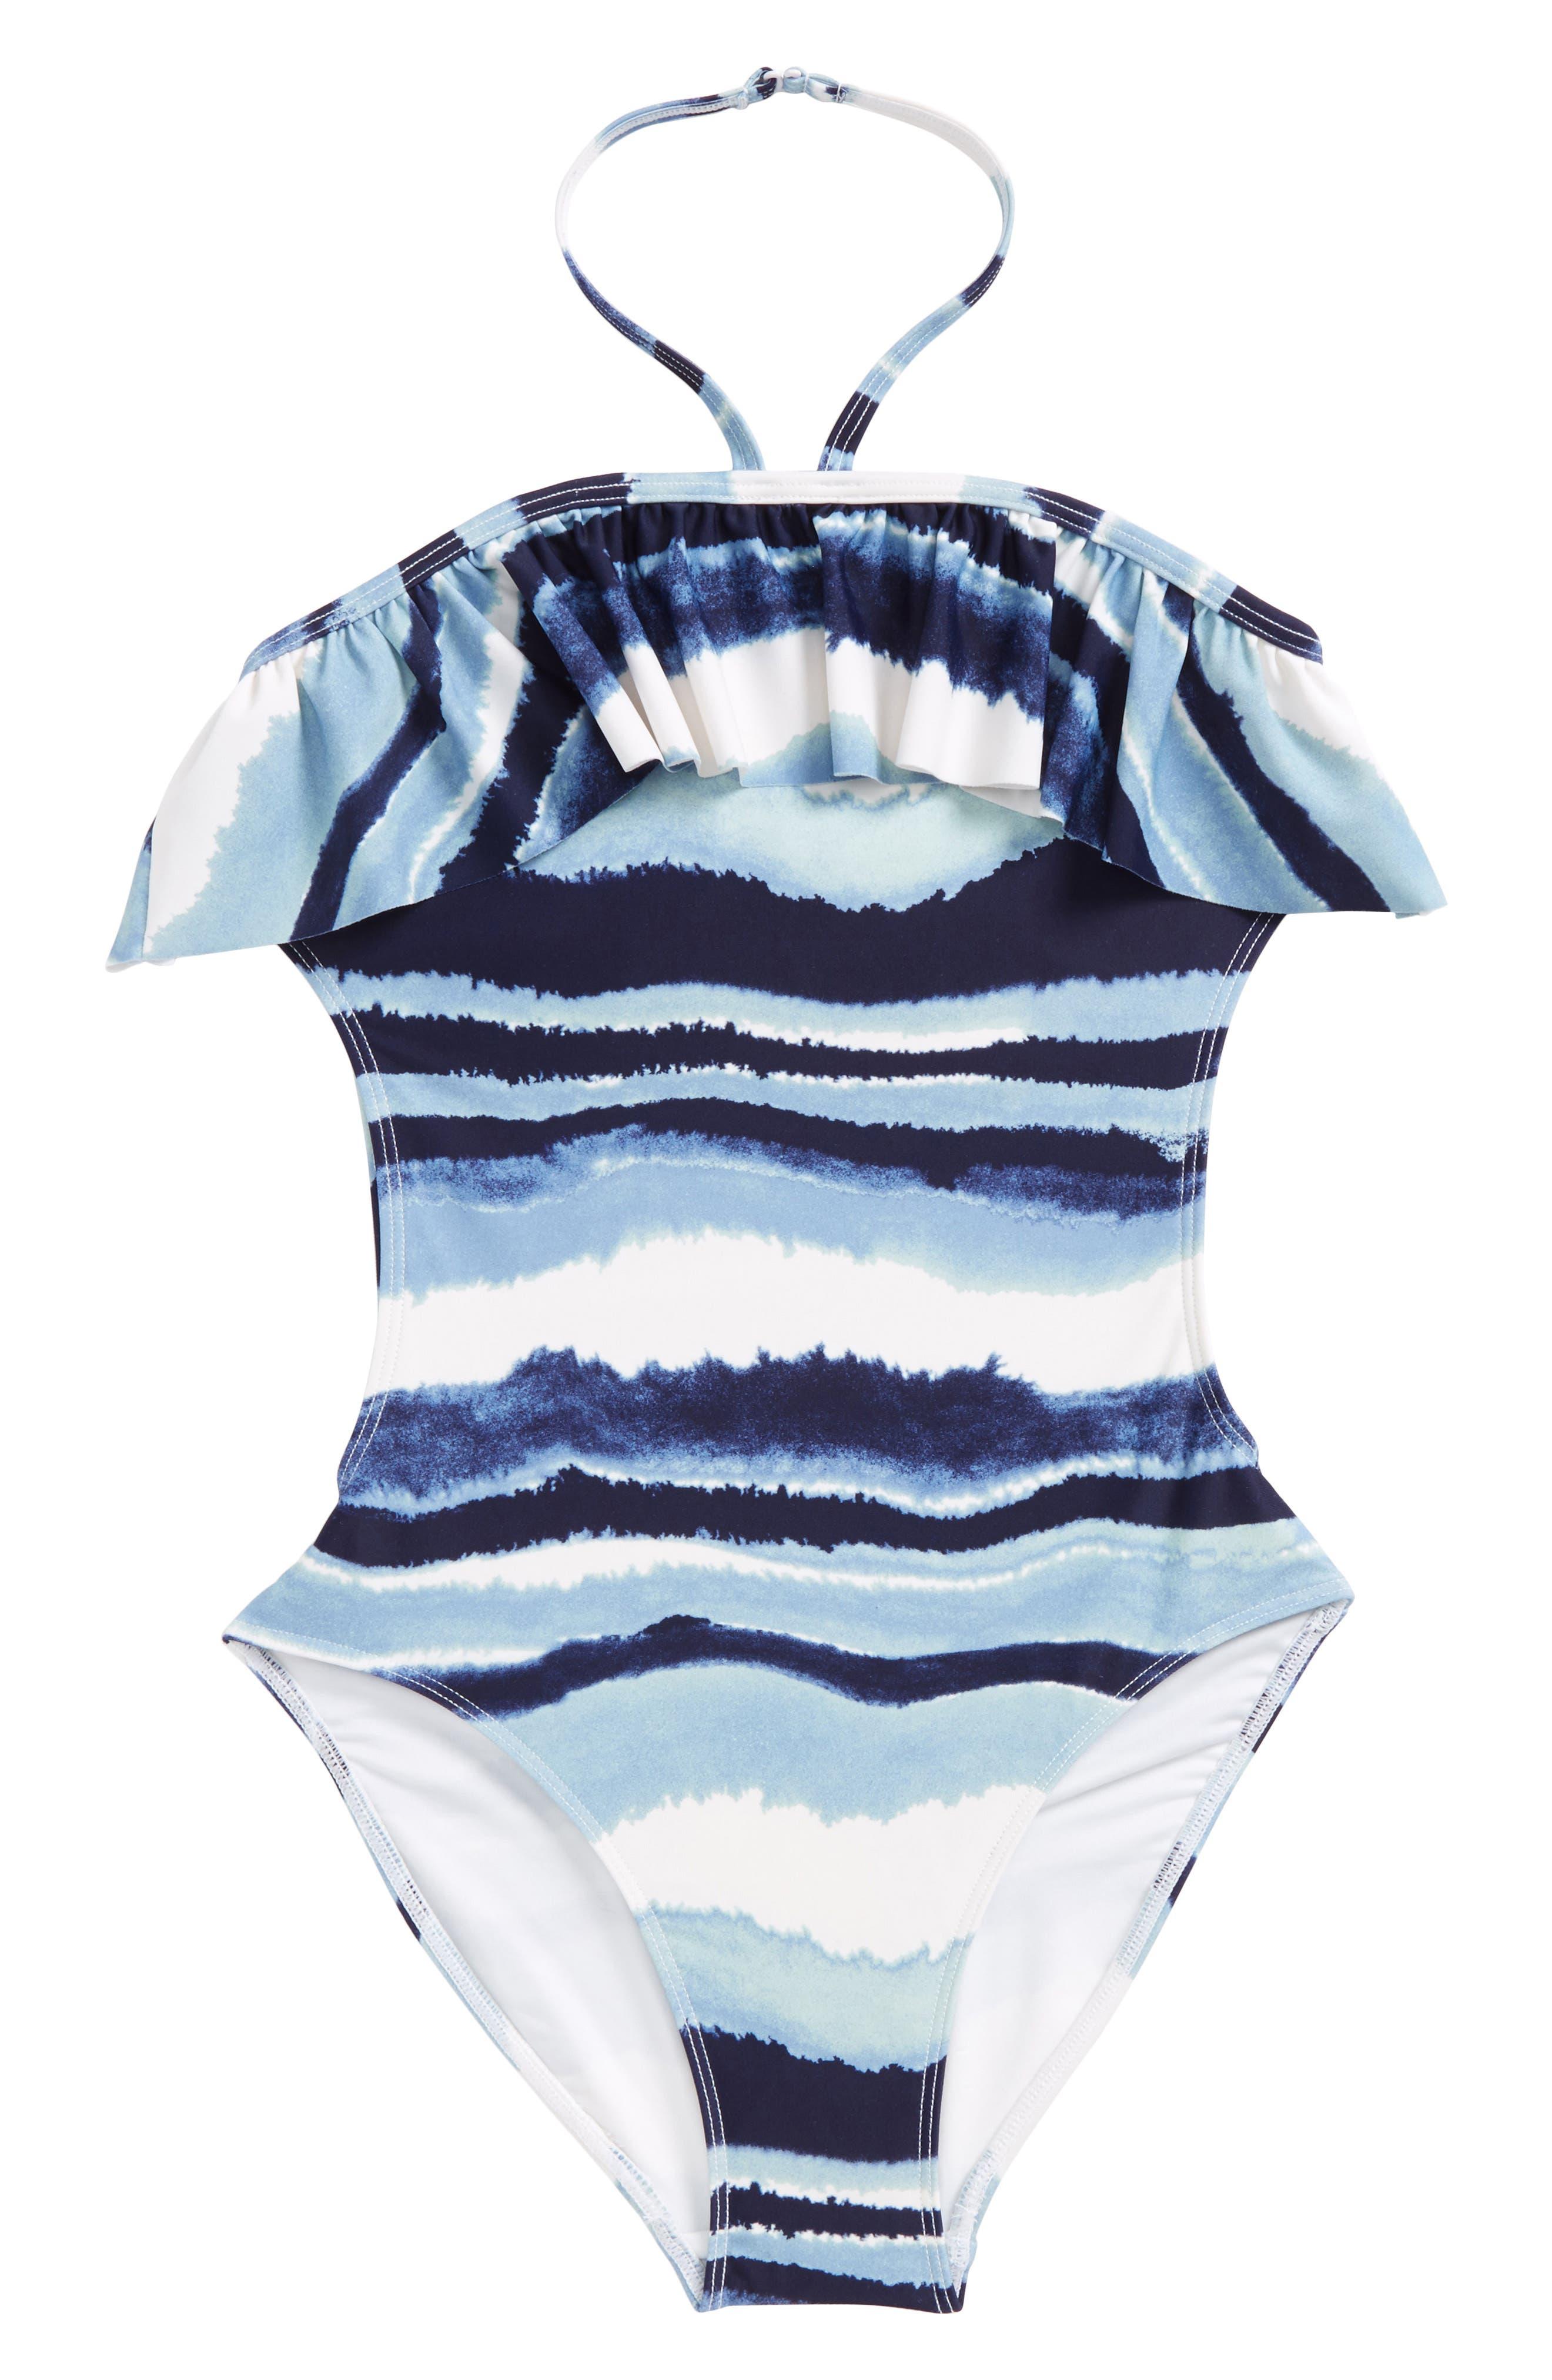 Alternate Image 1 Selected - Tucker + Tate One-Piece Halter Swimsuit (Big Girls)